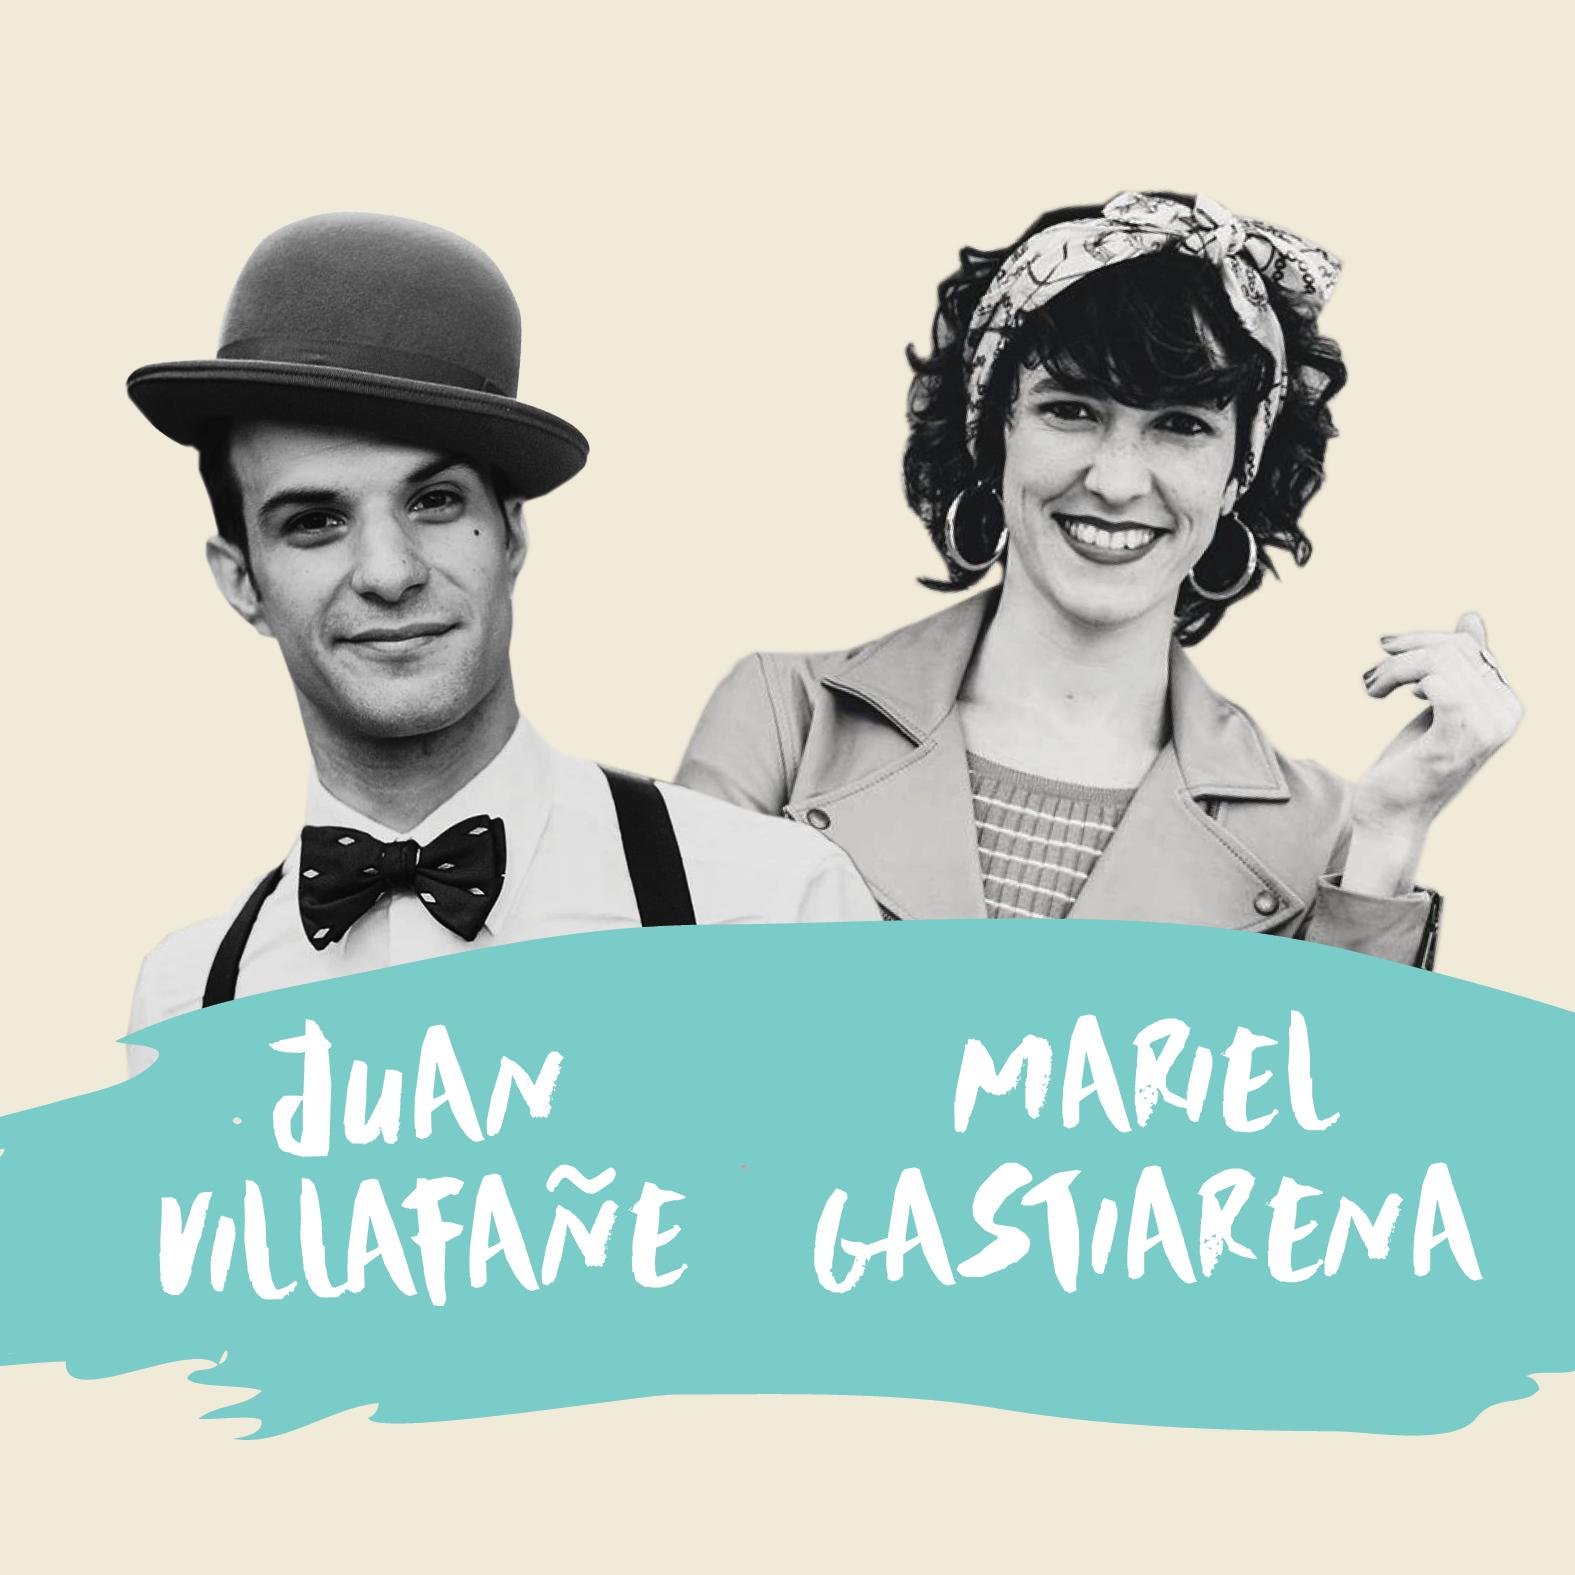 Juan Villafañe & Mariel Gastiarena